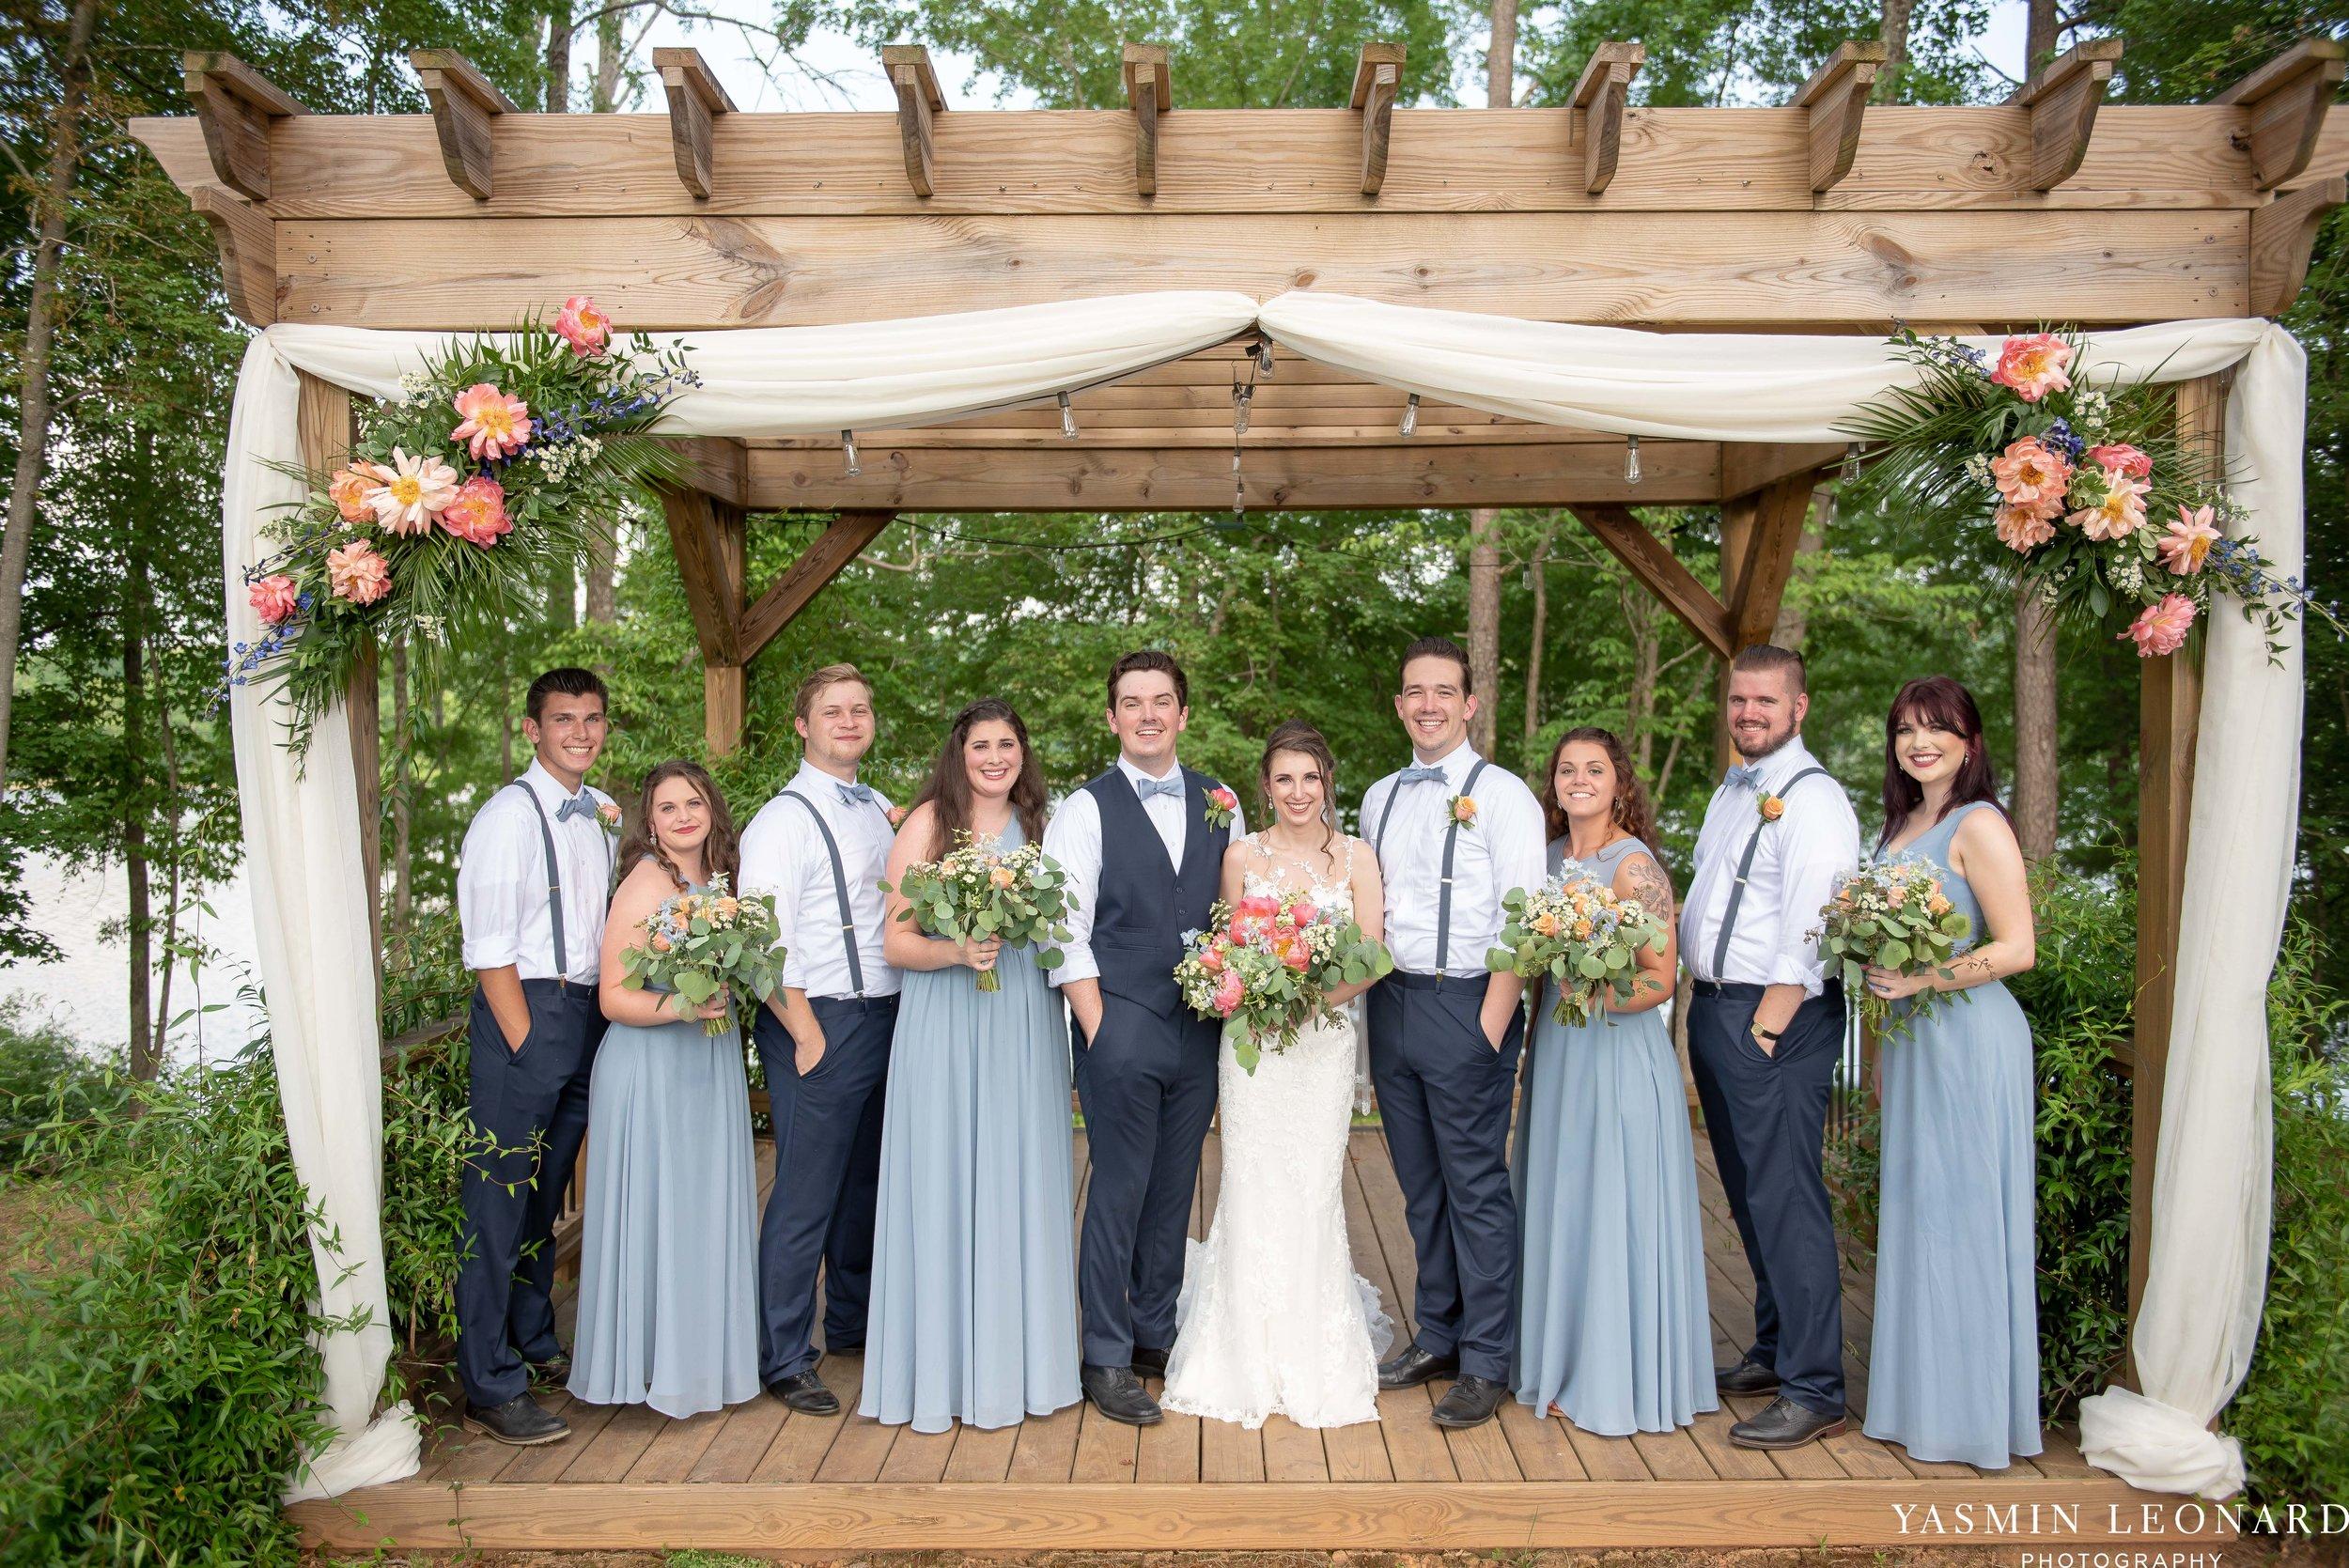 Old Homeplace Vineyard - NC Weddings - Outdoor Summer Weddings - Peony Boutique - Vineyard Wedding - NC Photographer - Yasmin Leonard Photography-35.jpg